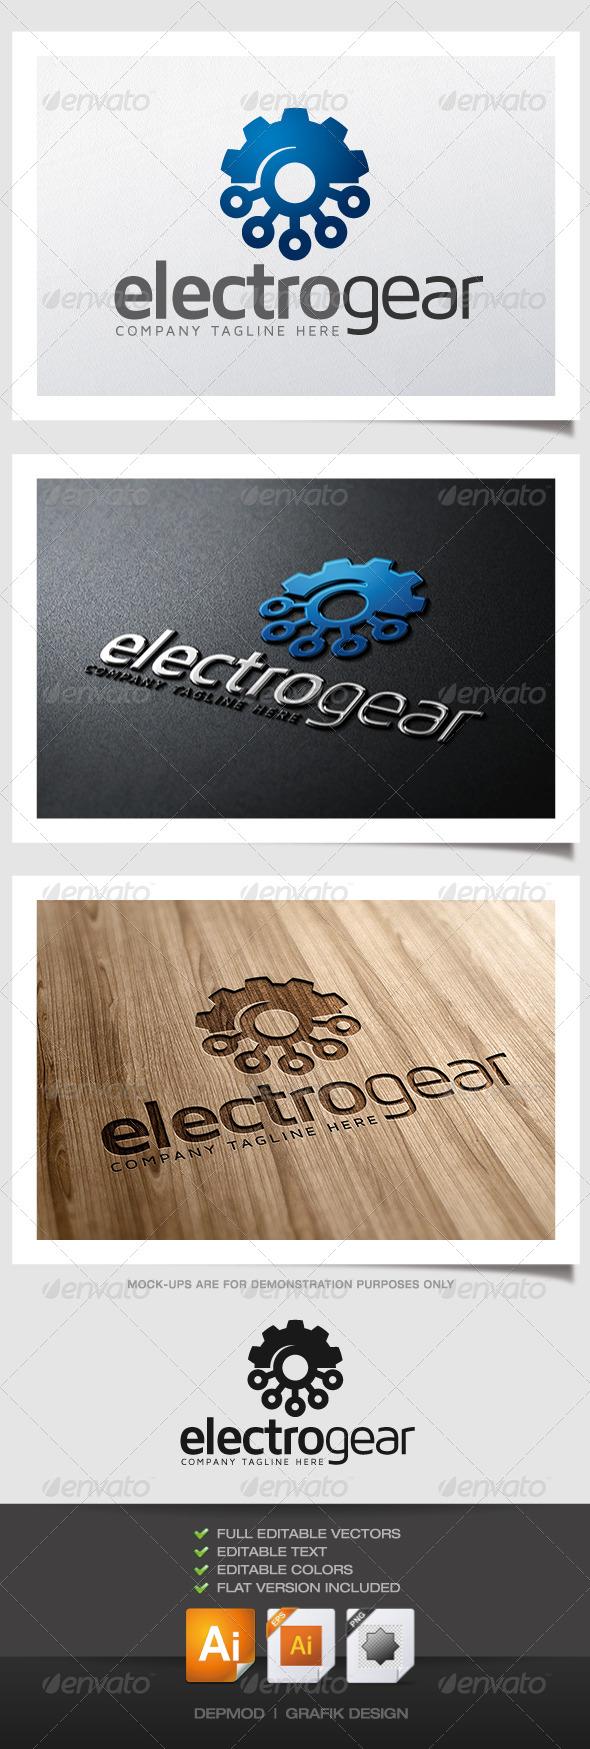 GraphicRiver Electro Gear Logo 4882364